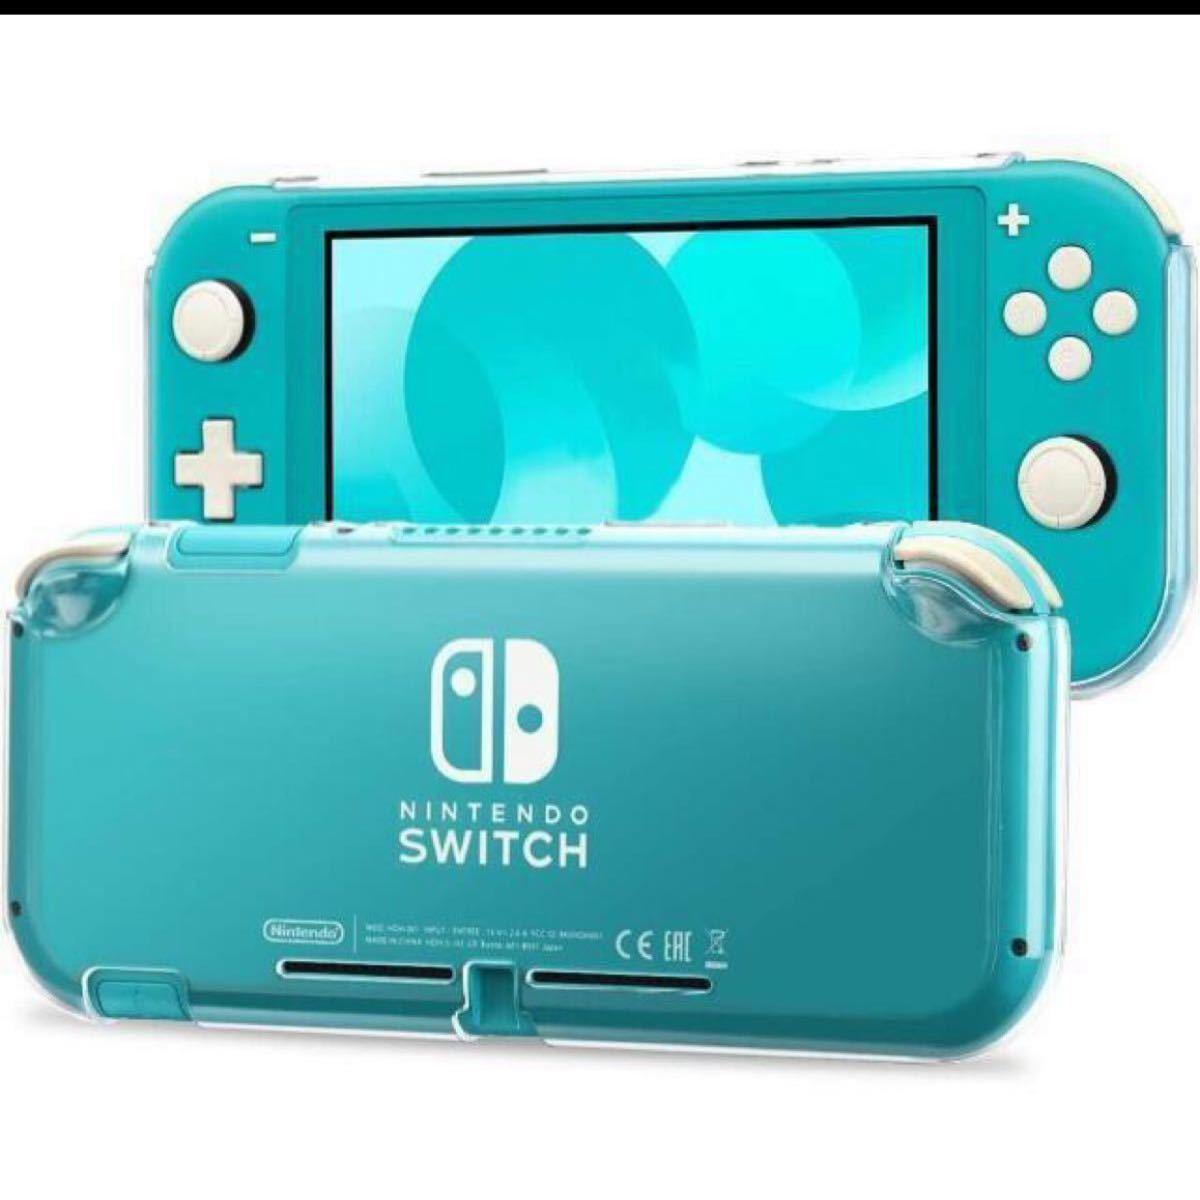 Switch Lite ケース コンパチブル Nintendo Switch Lite 超薄型 透明 保護カバー 任天堂